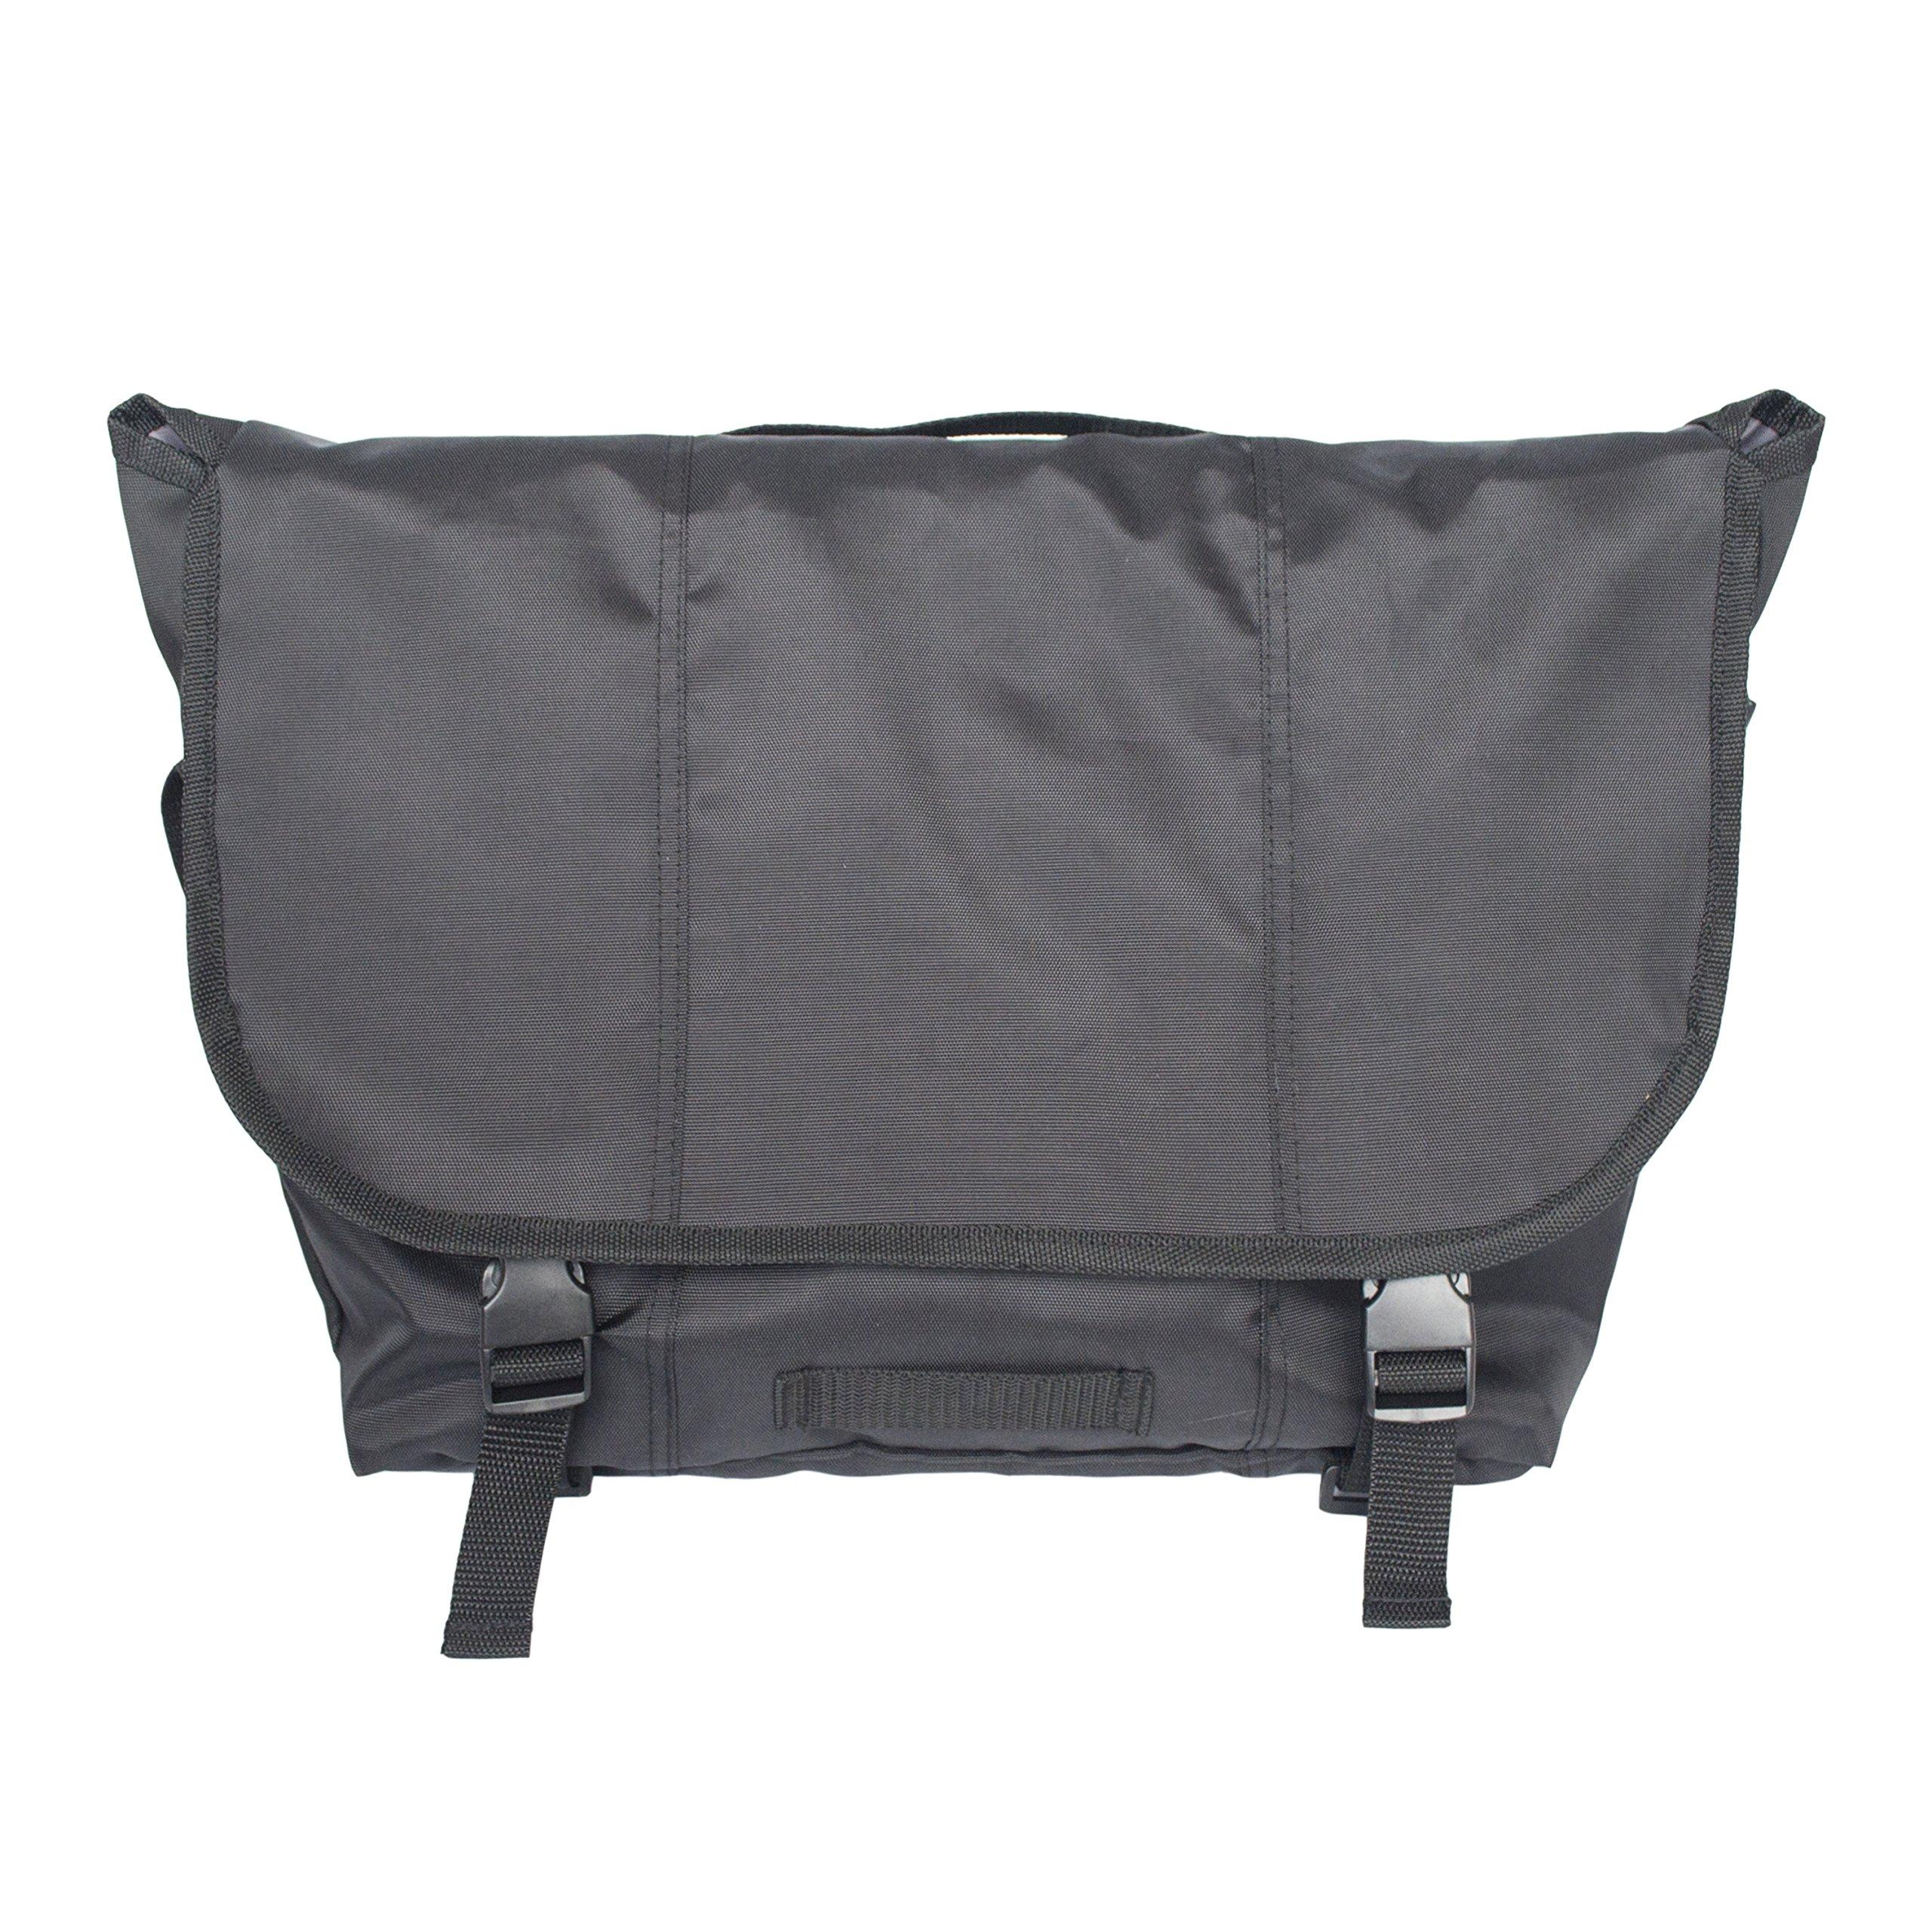 Classic Messenger Bag for Men Women,Travel Shoulder Crossbody Sling Working Laptop Bag (Black, 7''x18''x12'')